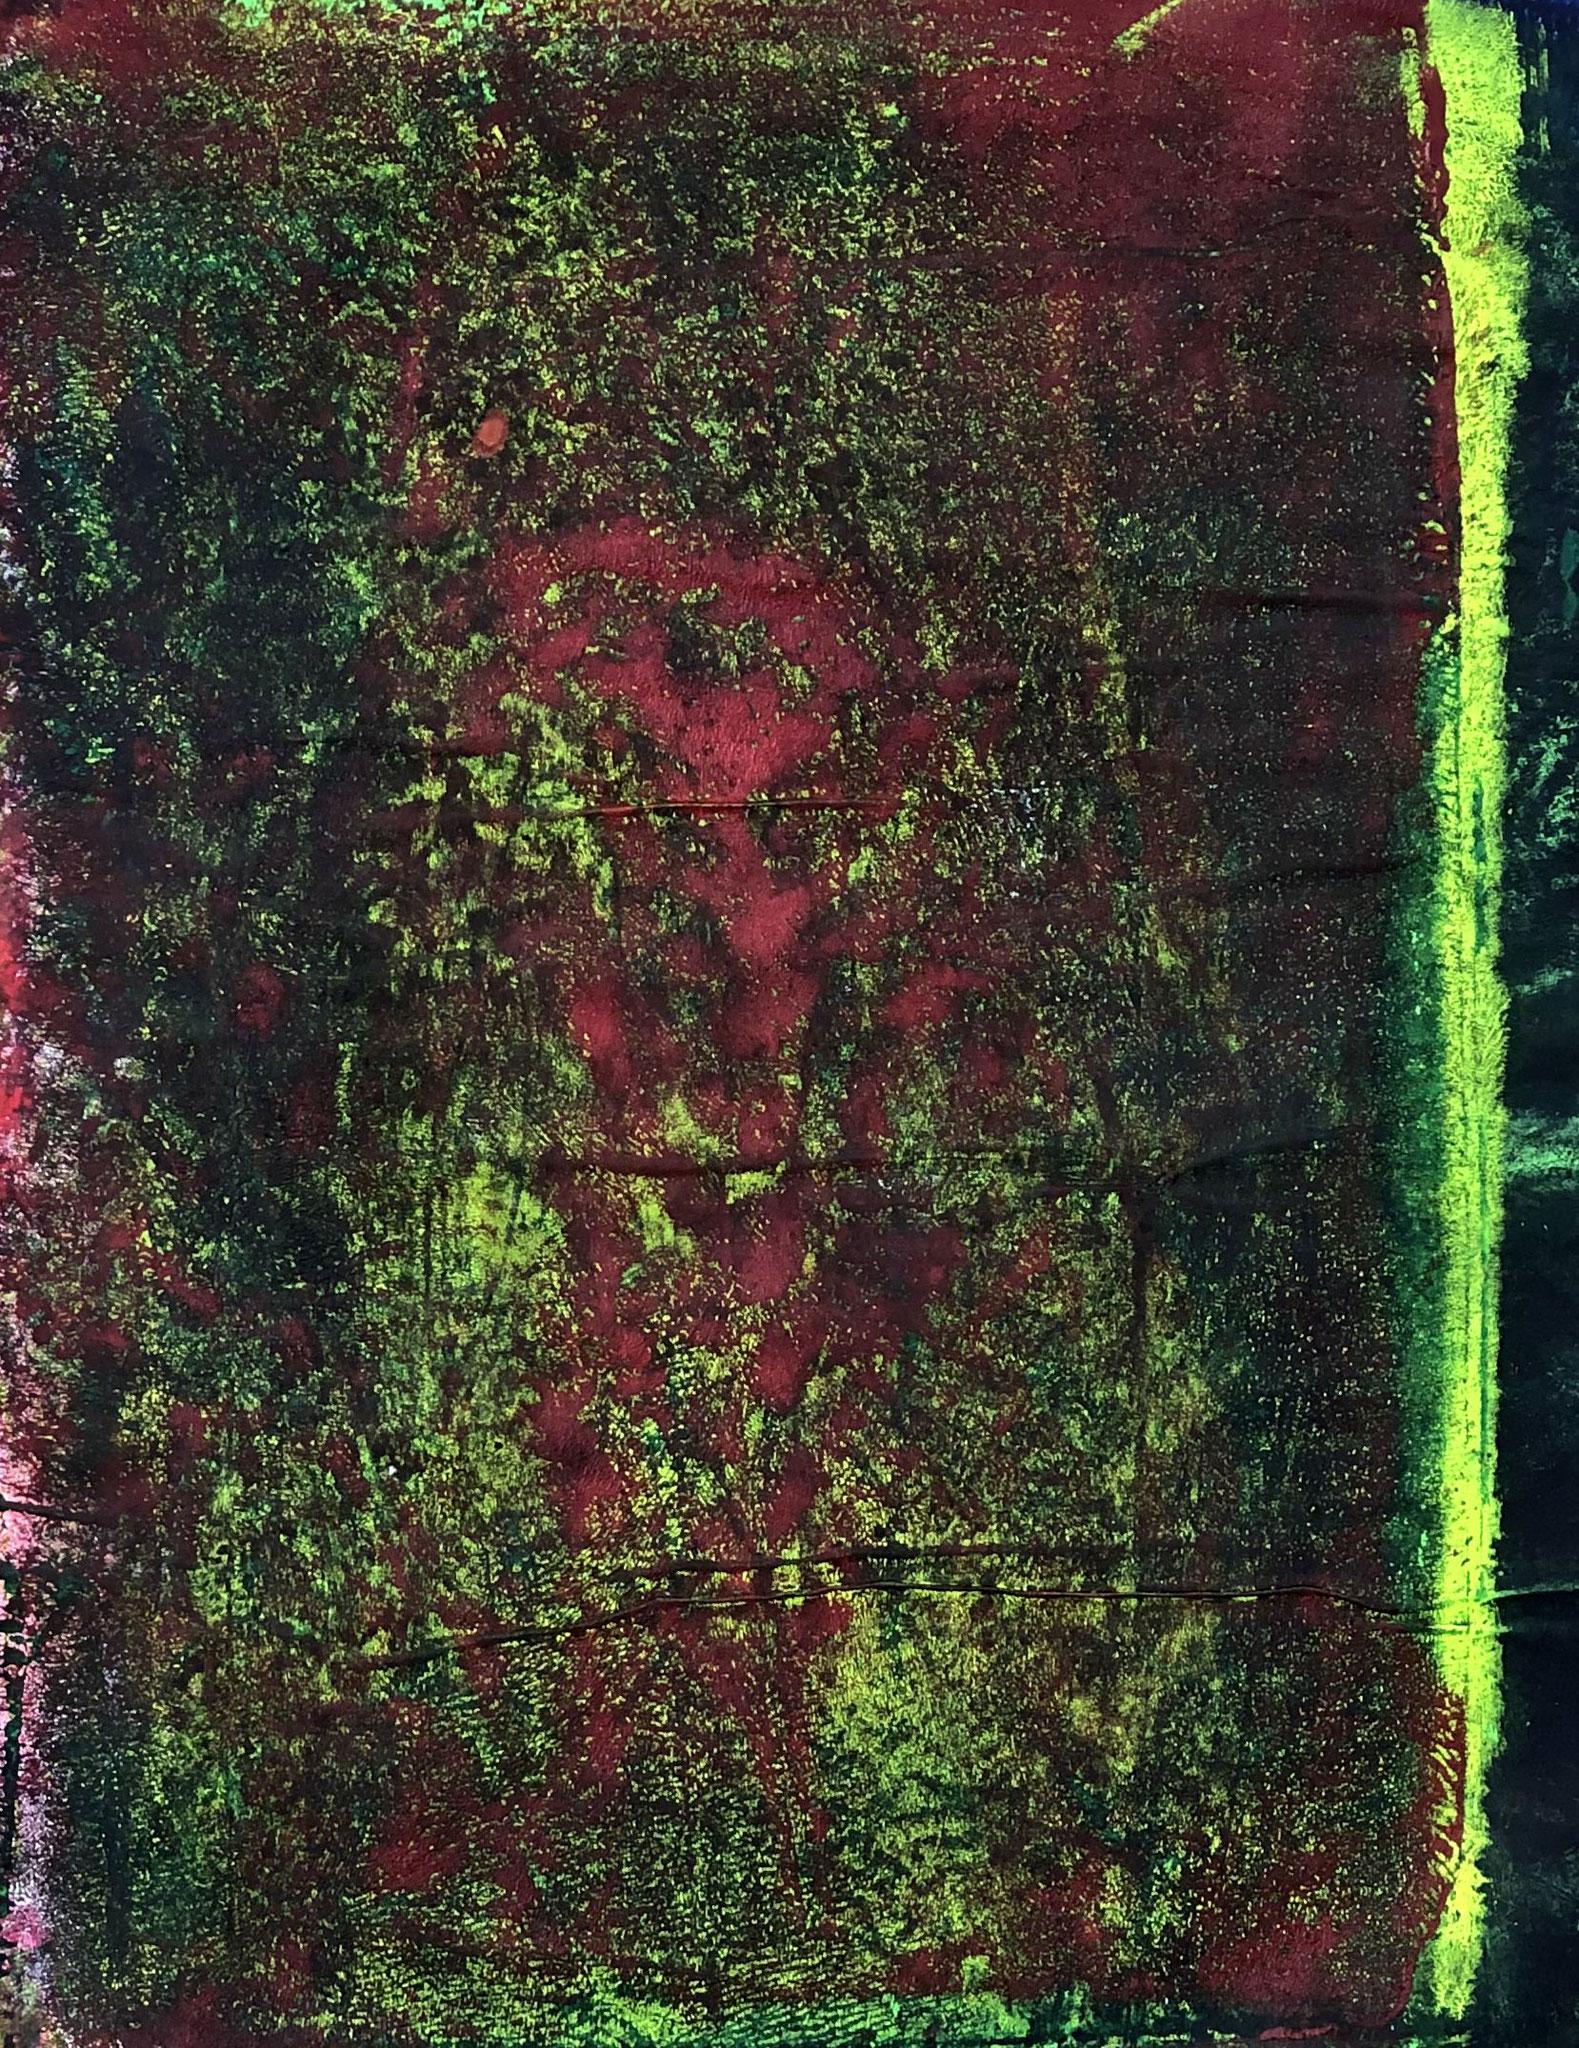 WINGS-DEAR FRIEND Acryl auf Papier - 40 x 30 cm